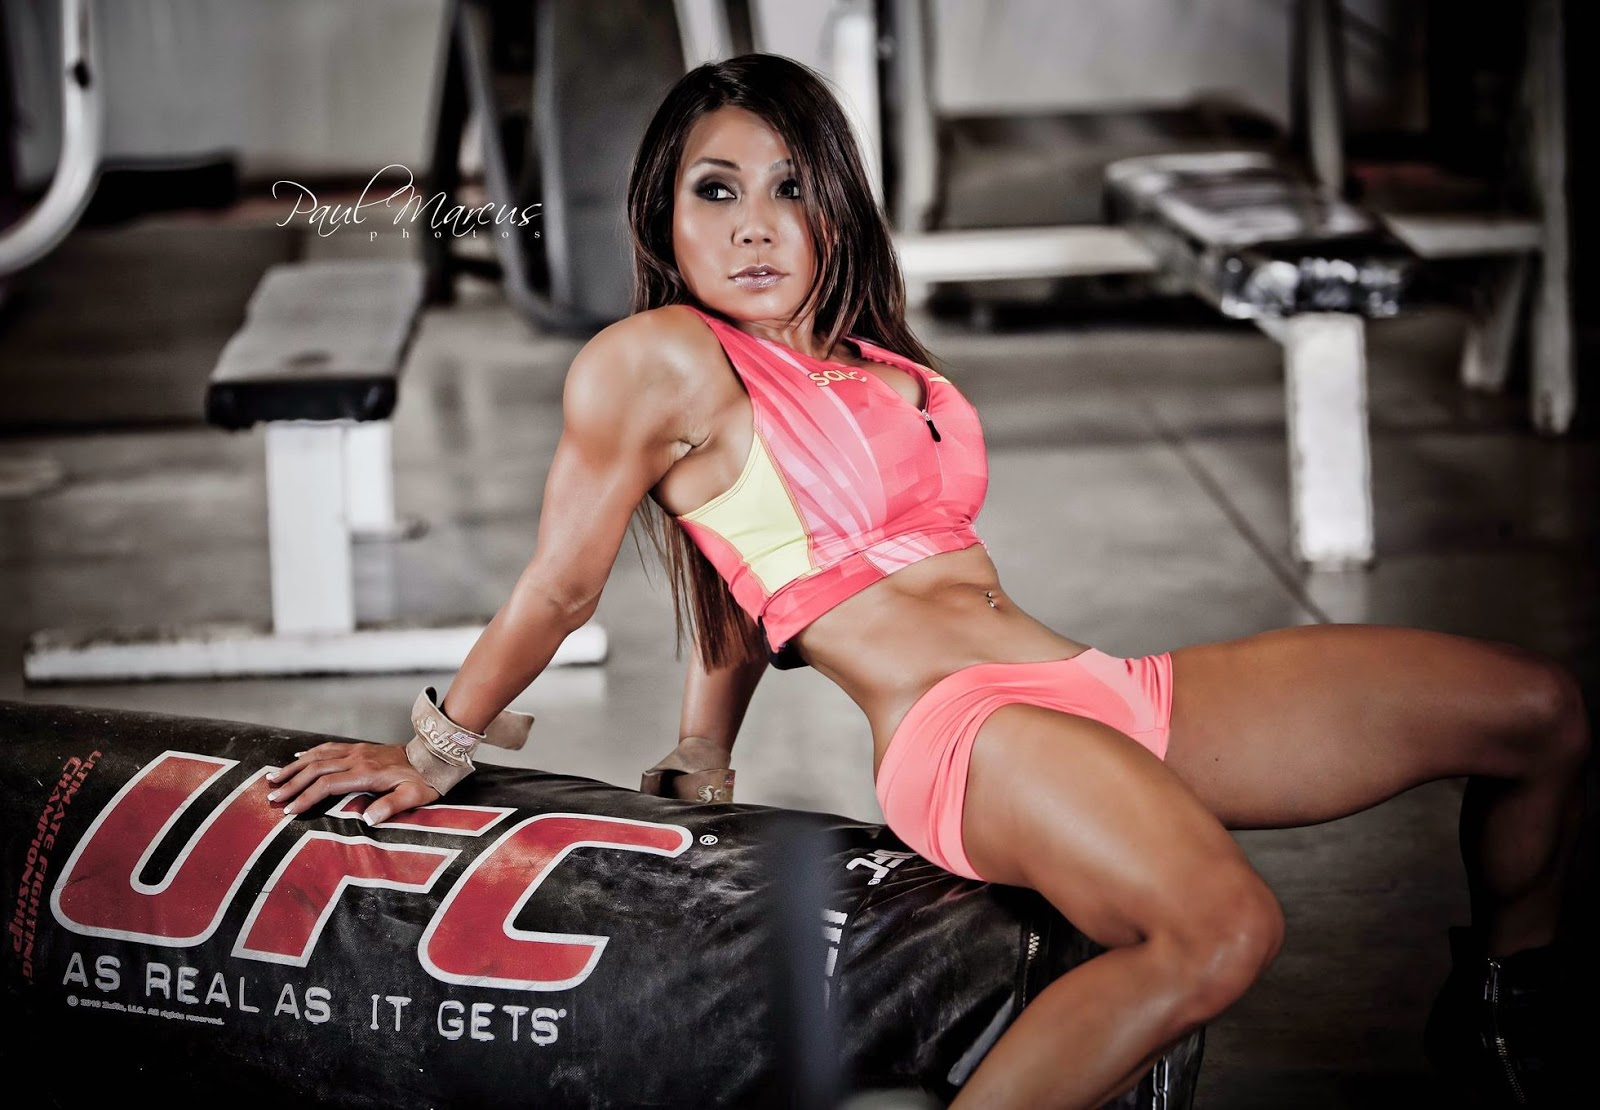 Khanh T Nguyen - Hottest Fitness Women